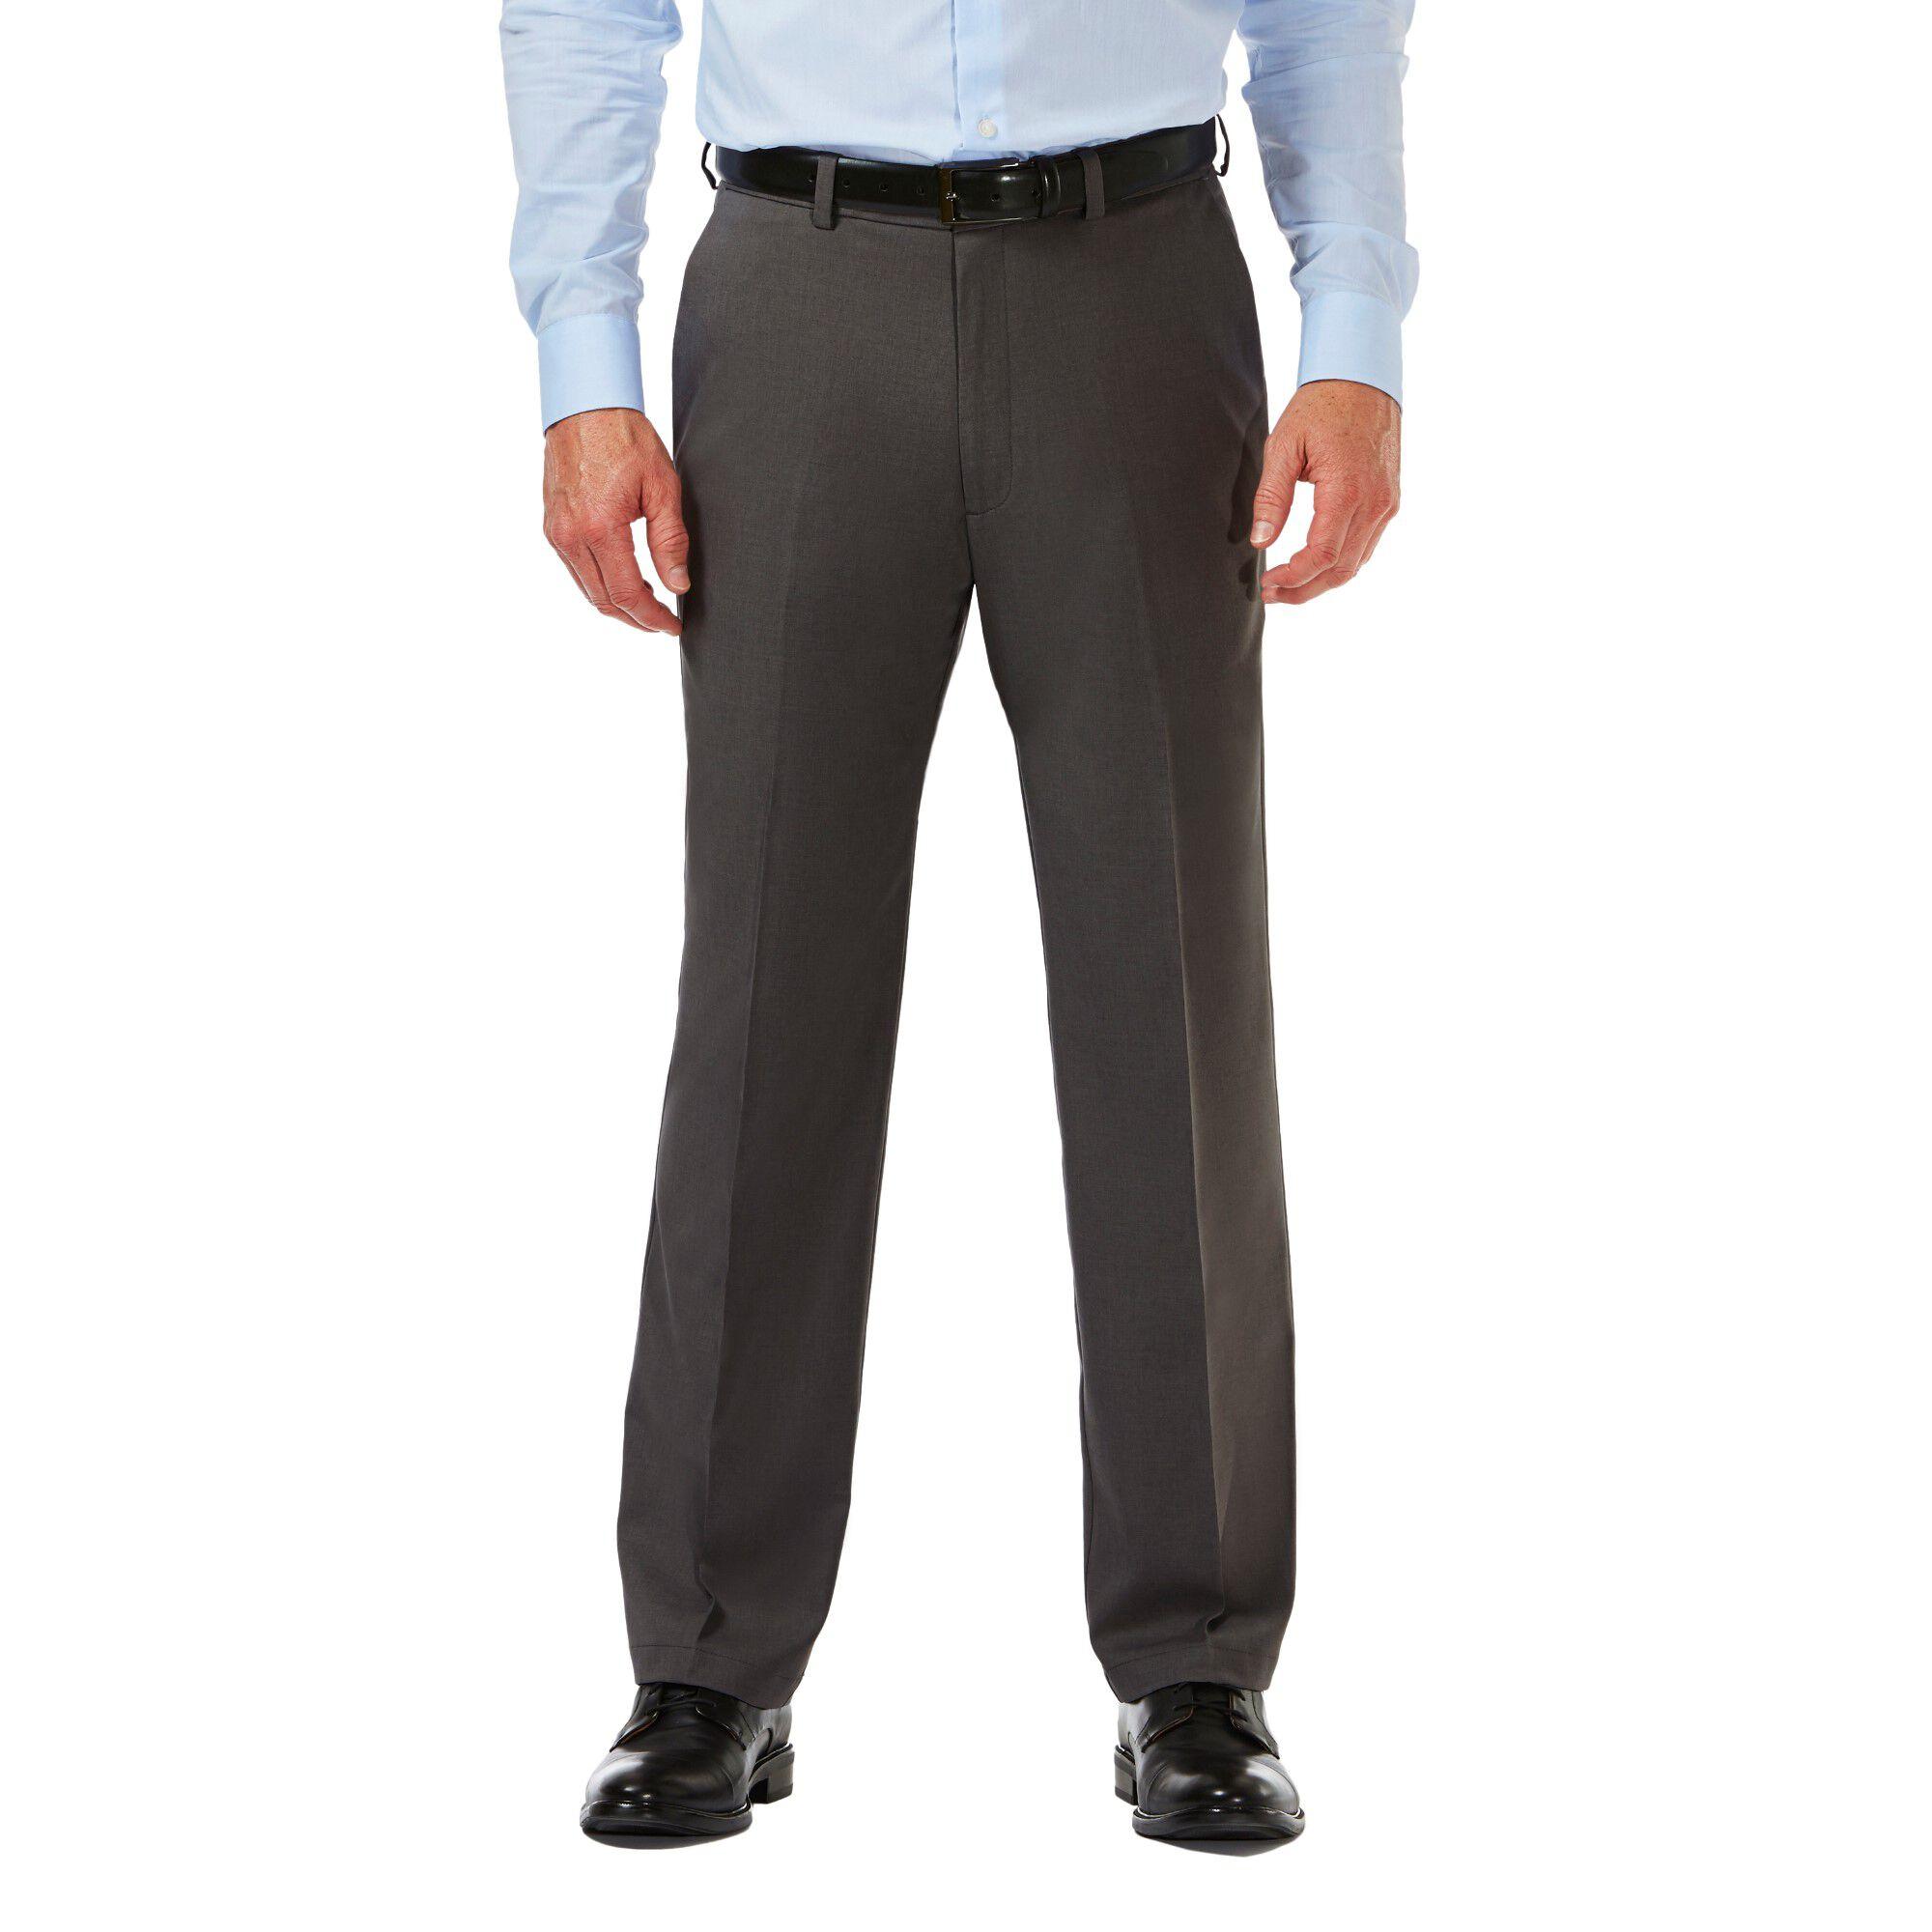 Bocaccio Boys Pleated Dress Pants with Belt